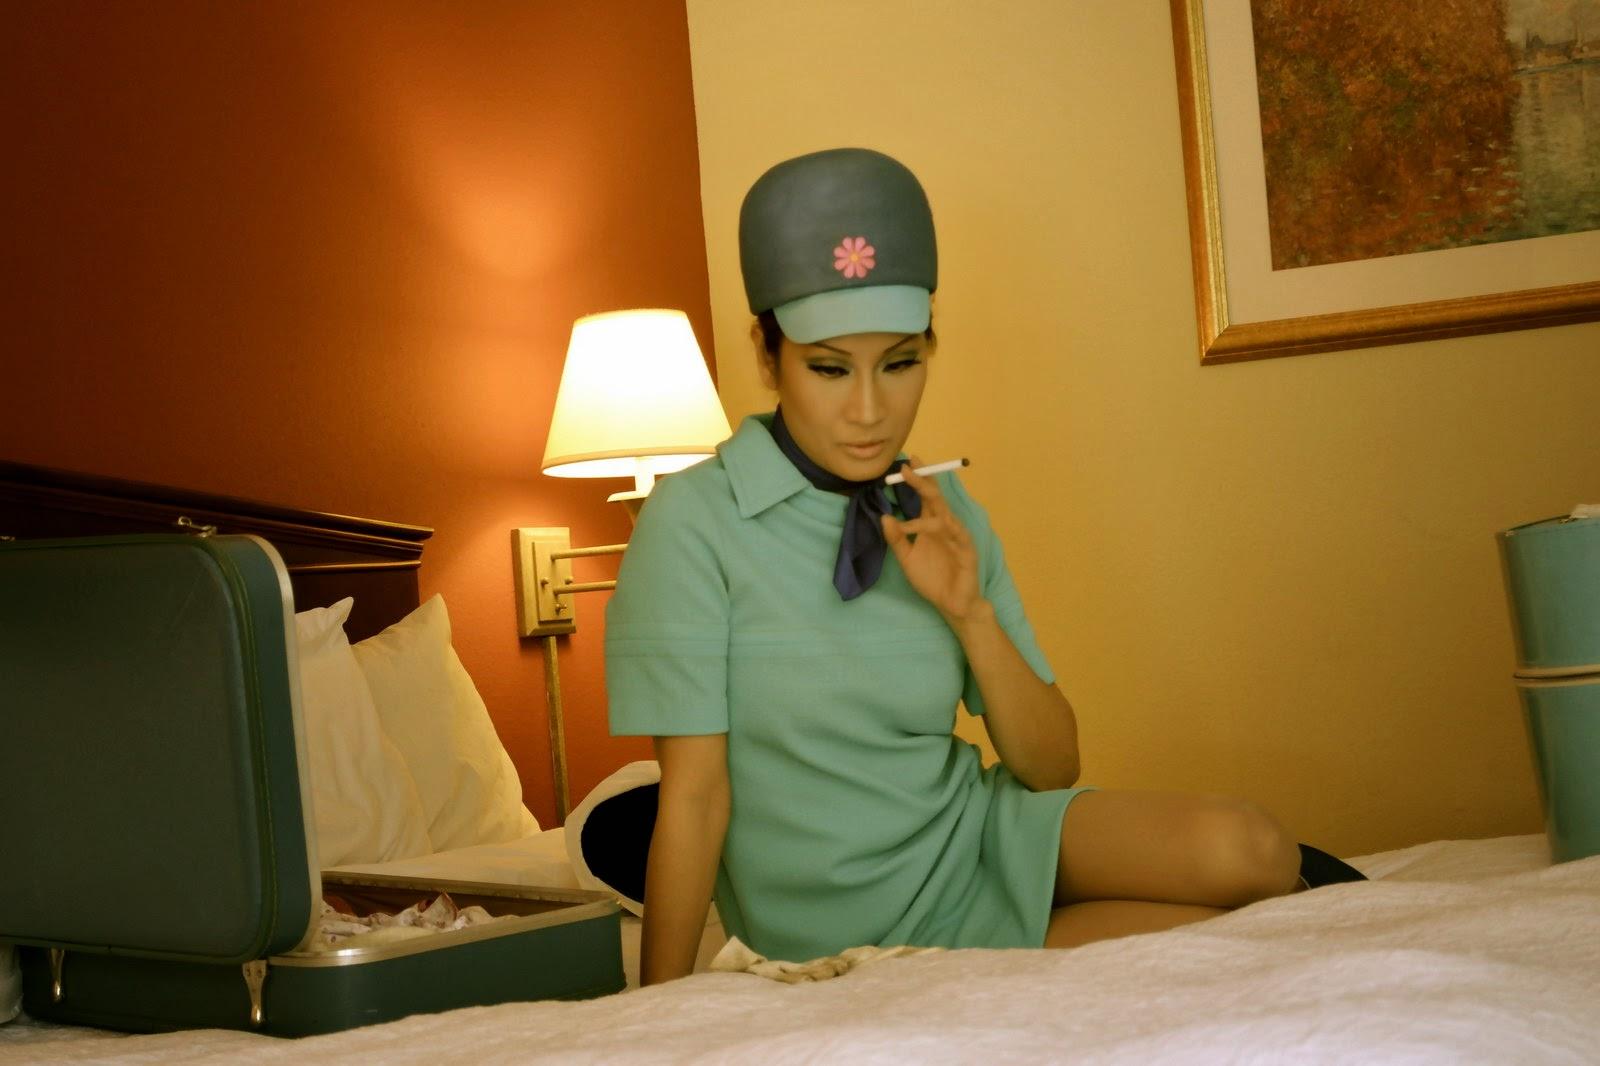 Фото стюардесса ххх, Голые стюардессы - Лучшее фото 3 фотография